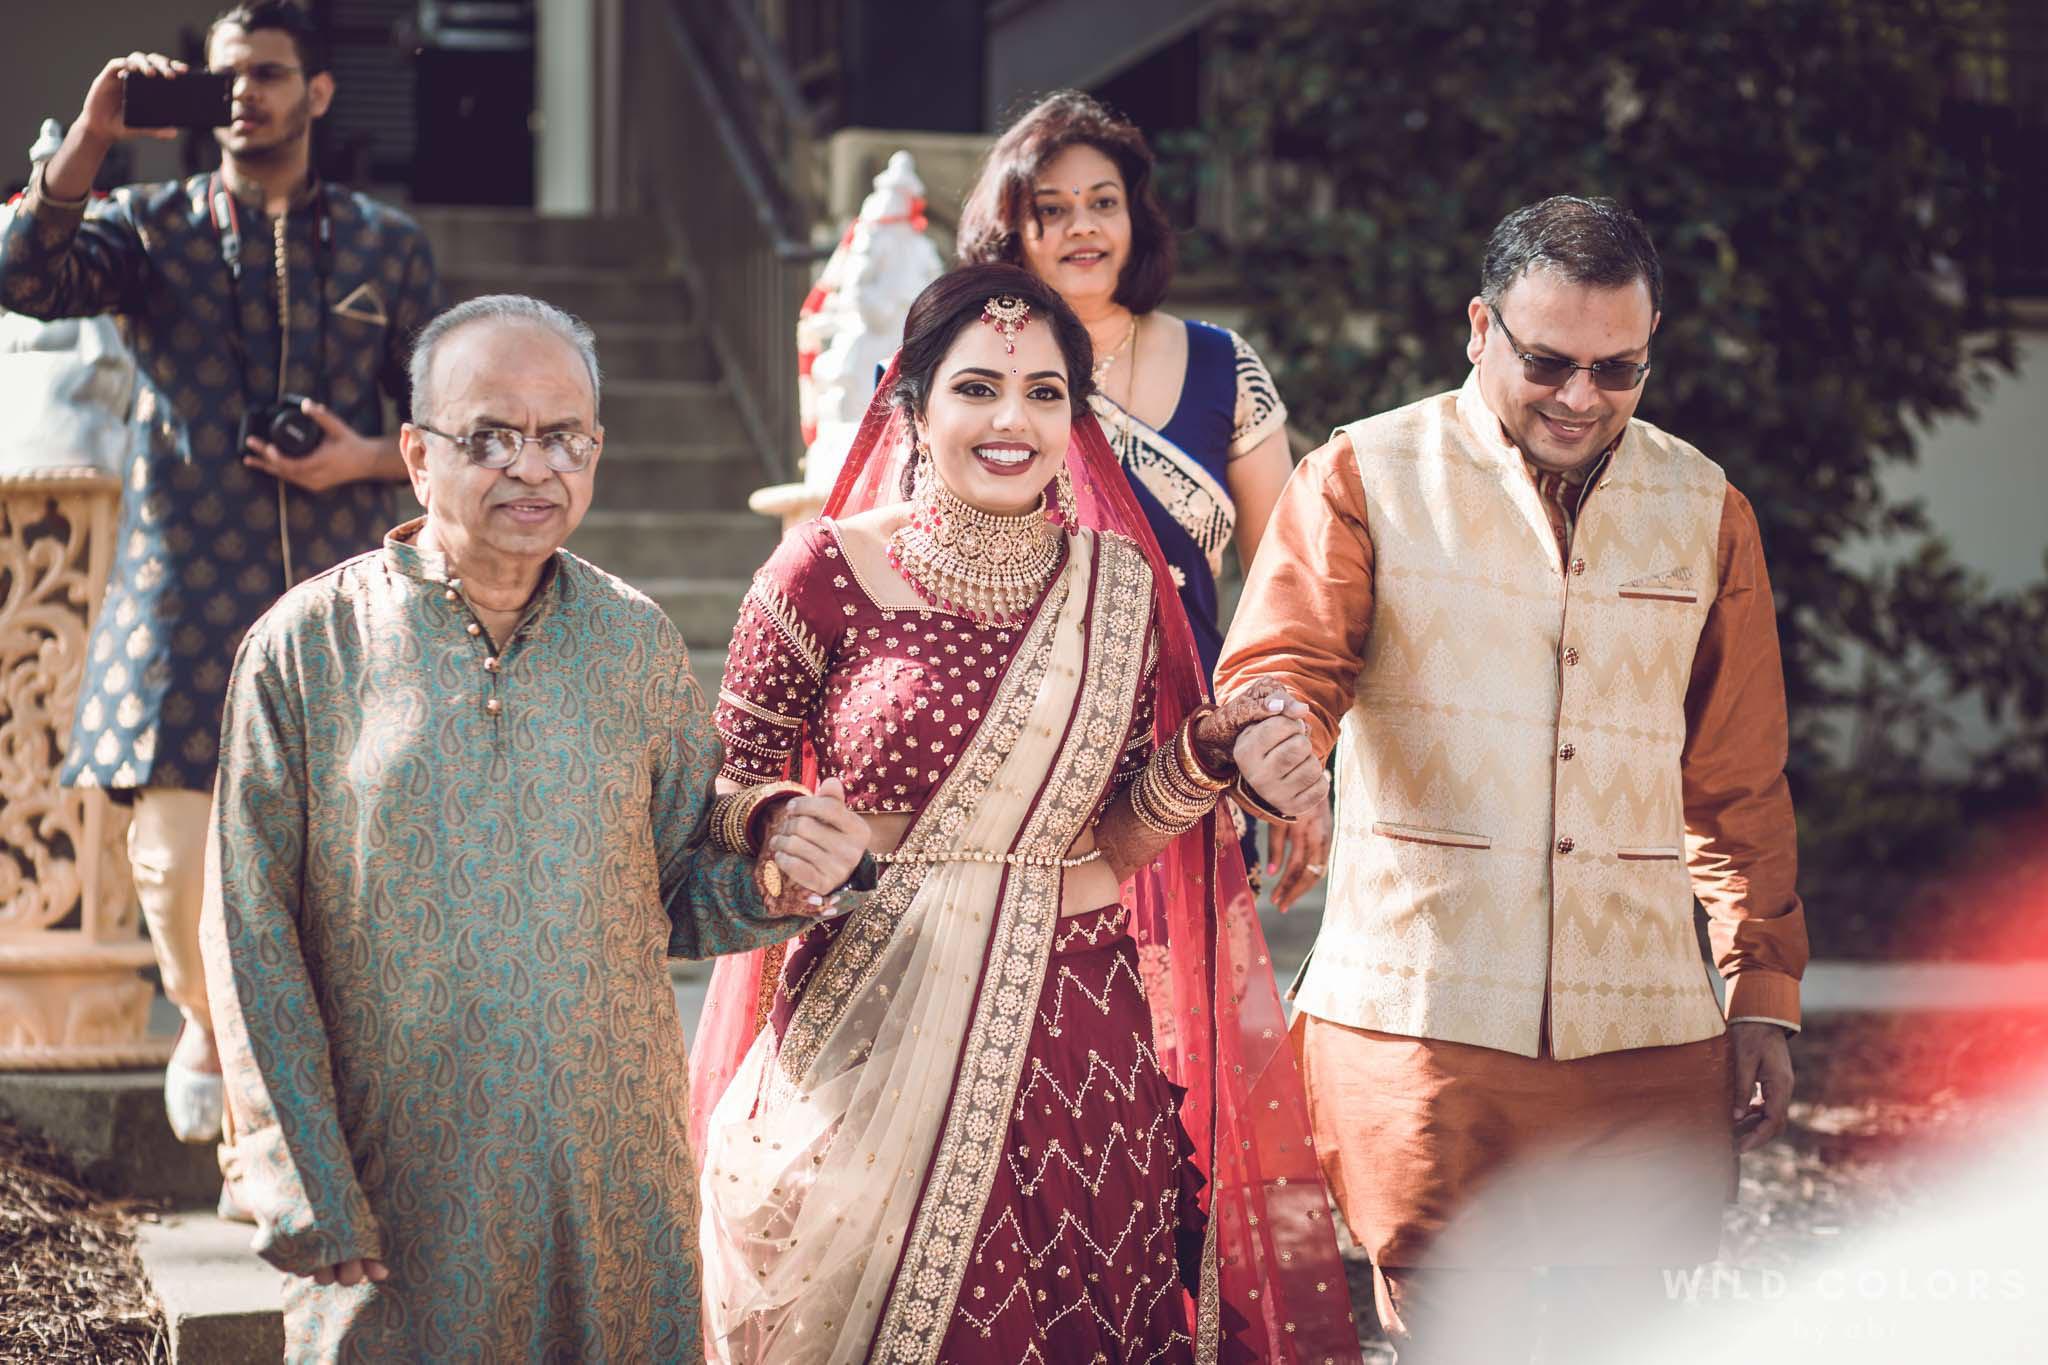 CANDID_INDIAN_WEDDING_ATLANTA_PHOTOGRAPHER-55.JPG